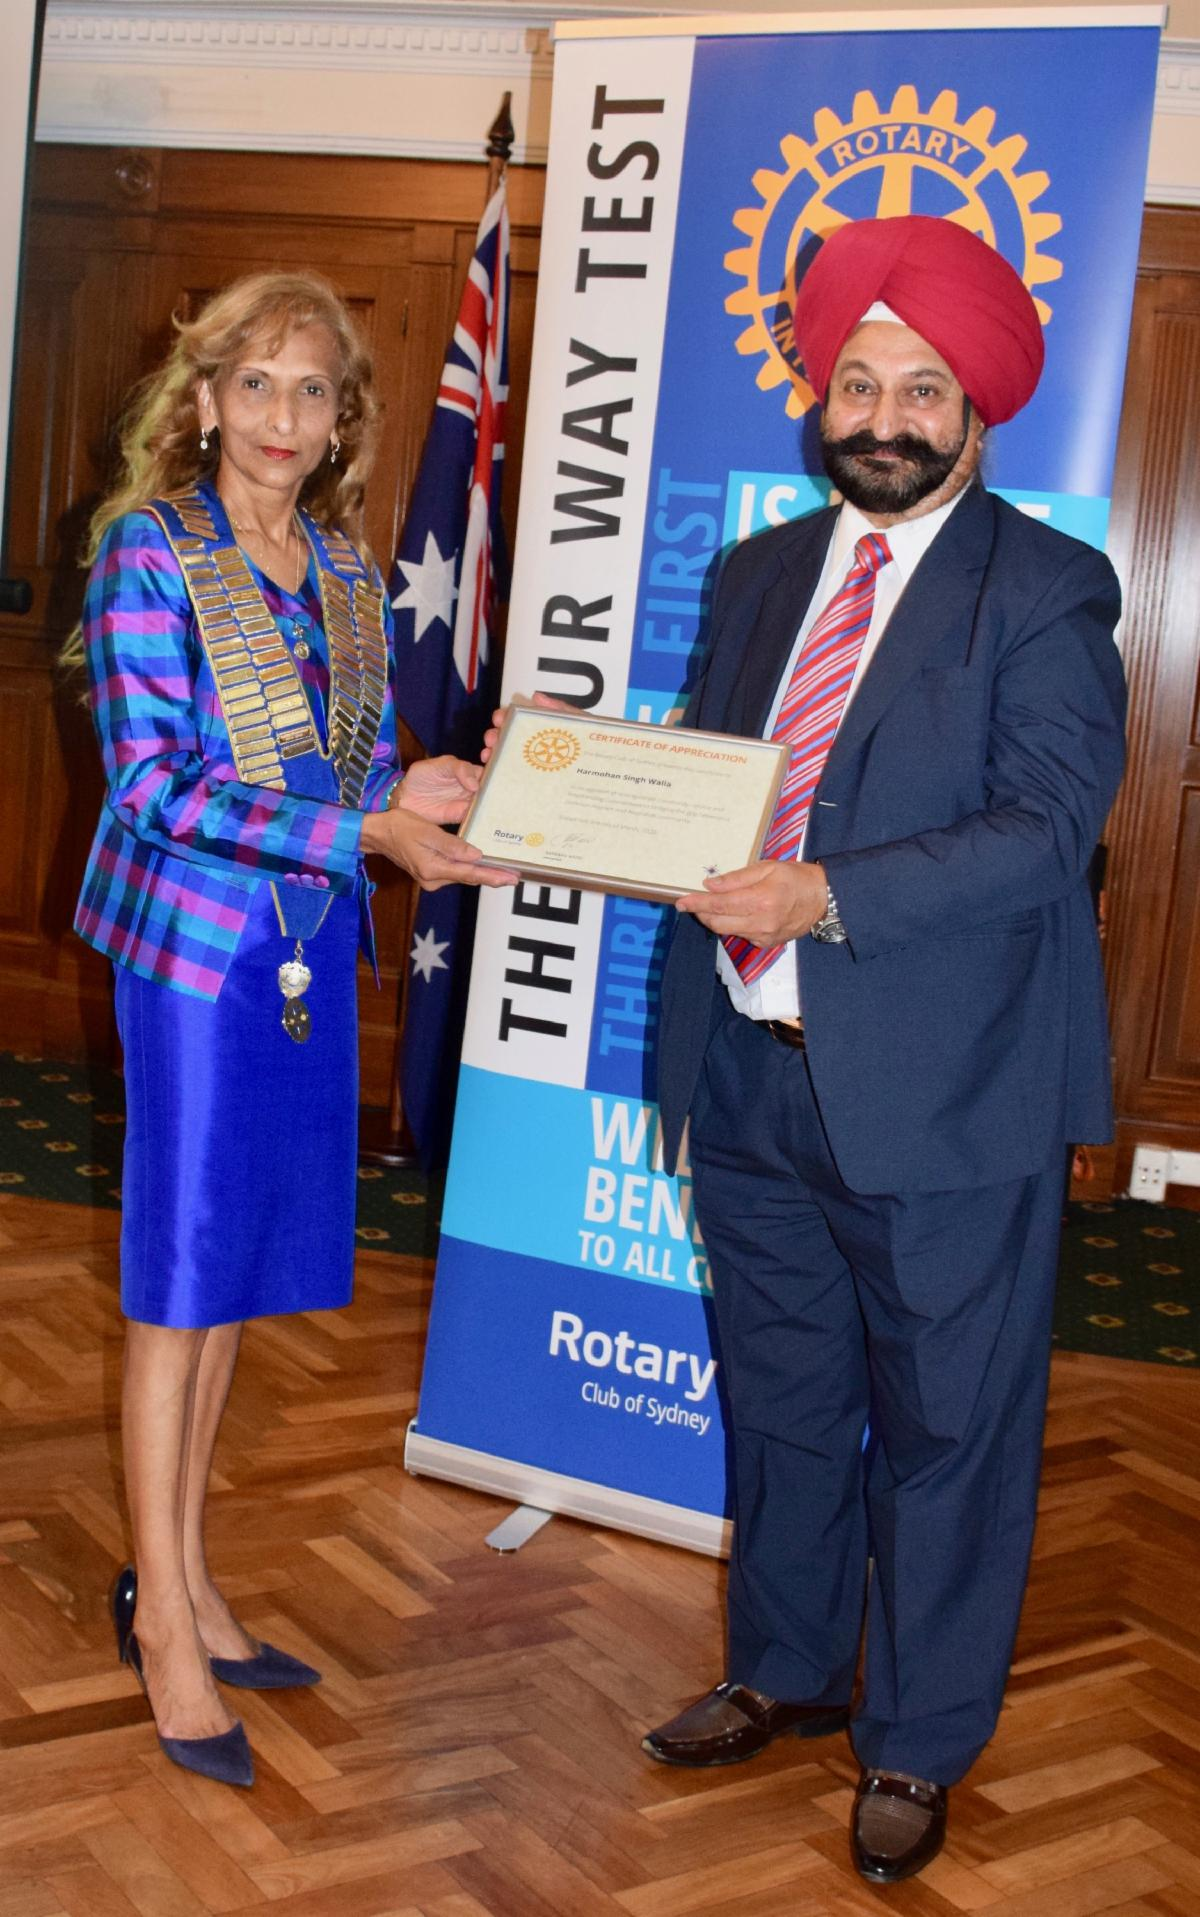 Rotary Club of Sydney honoring Harmohan Singh Walia